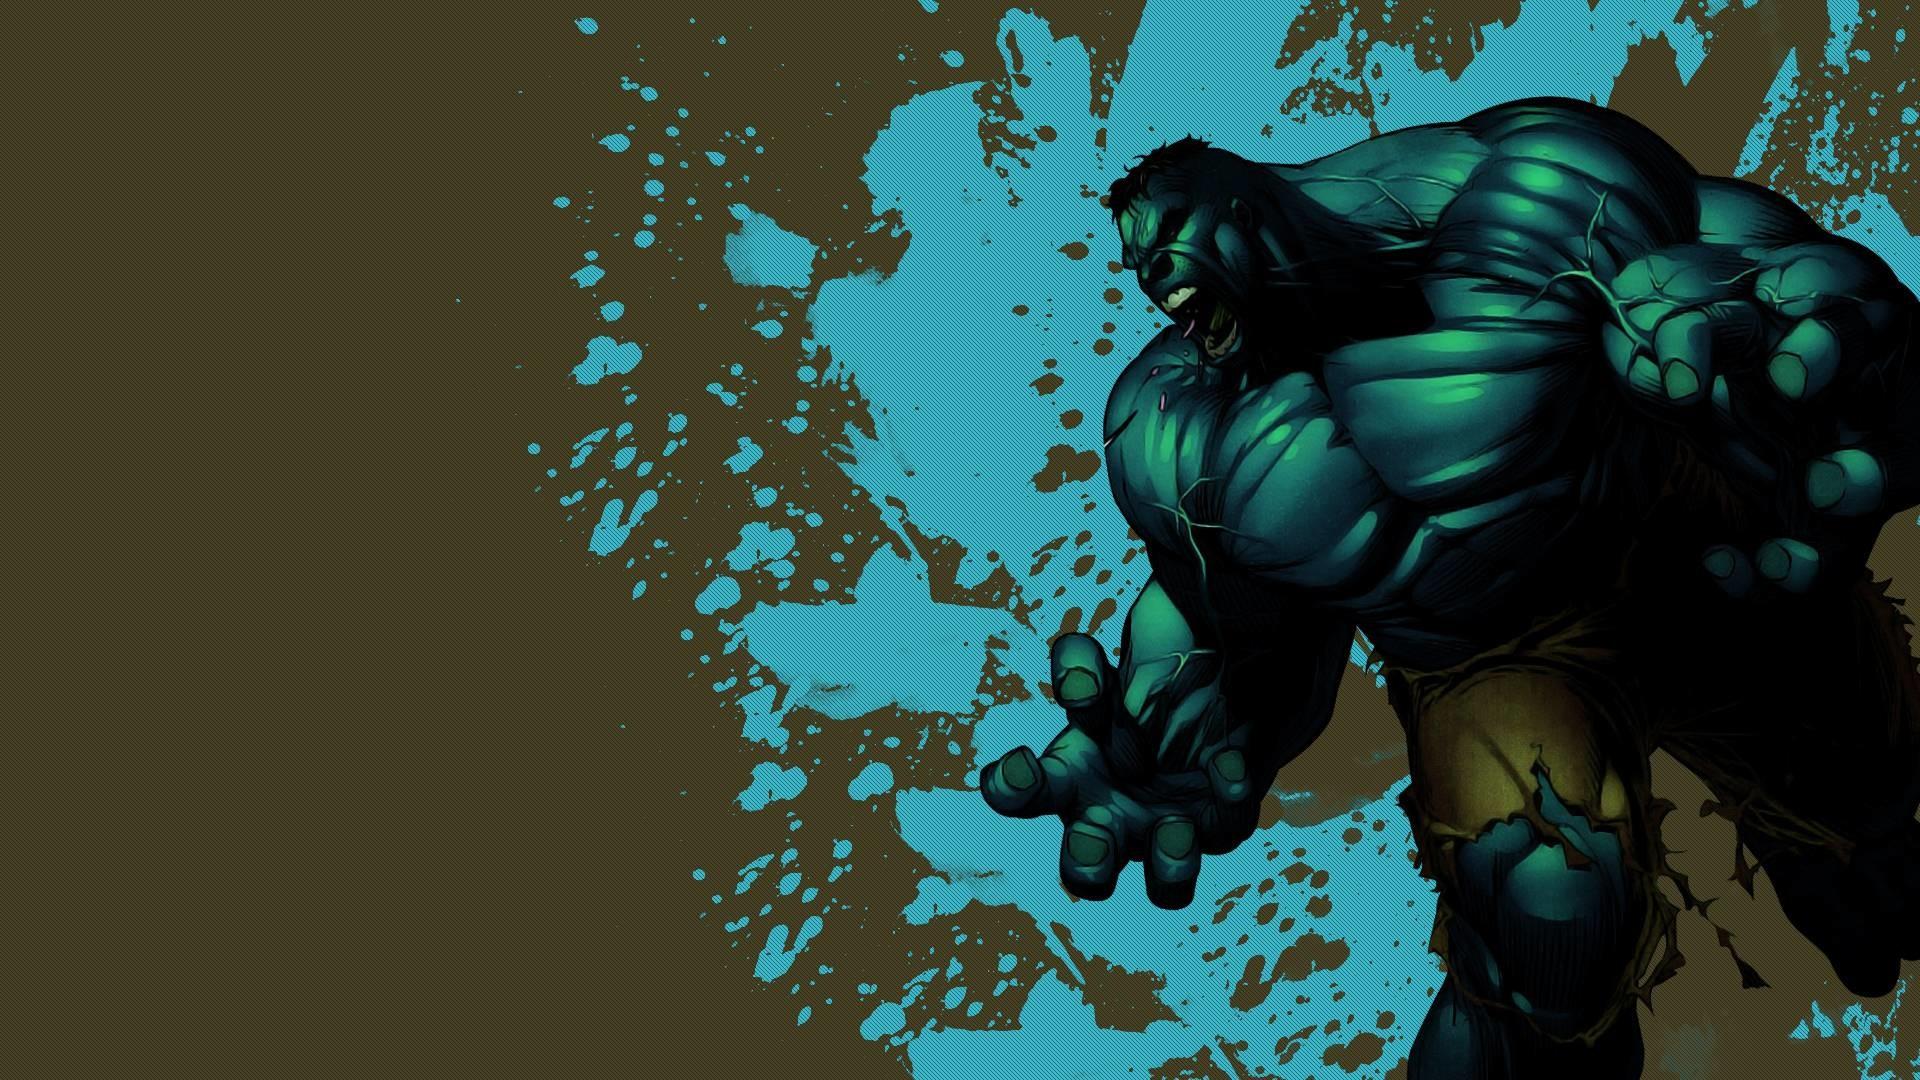 Res: 1920x1080, V.293 The Hulk Photo - The Hulk Images